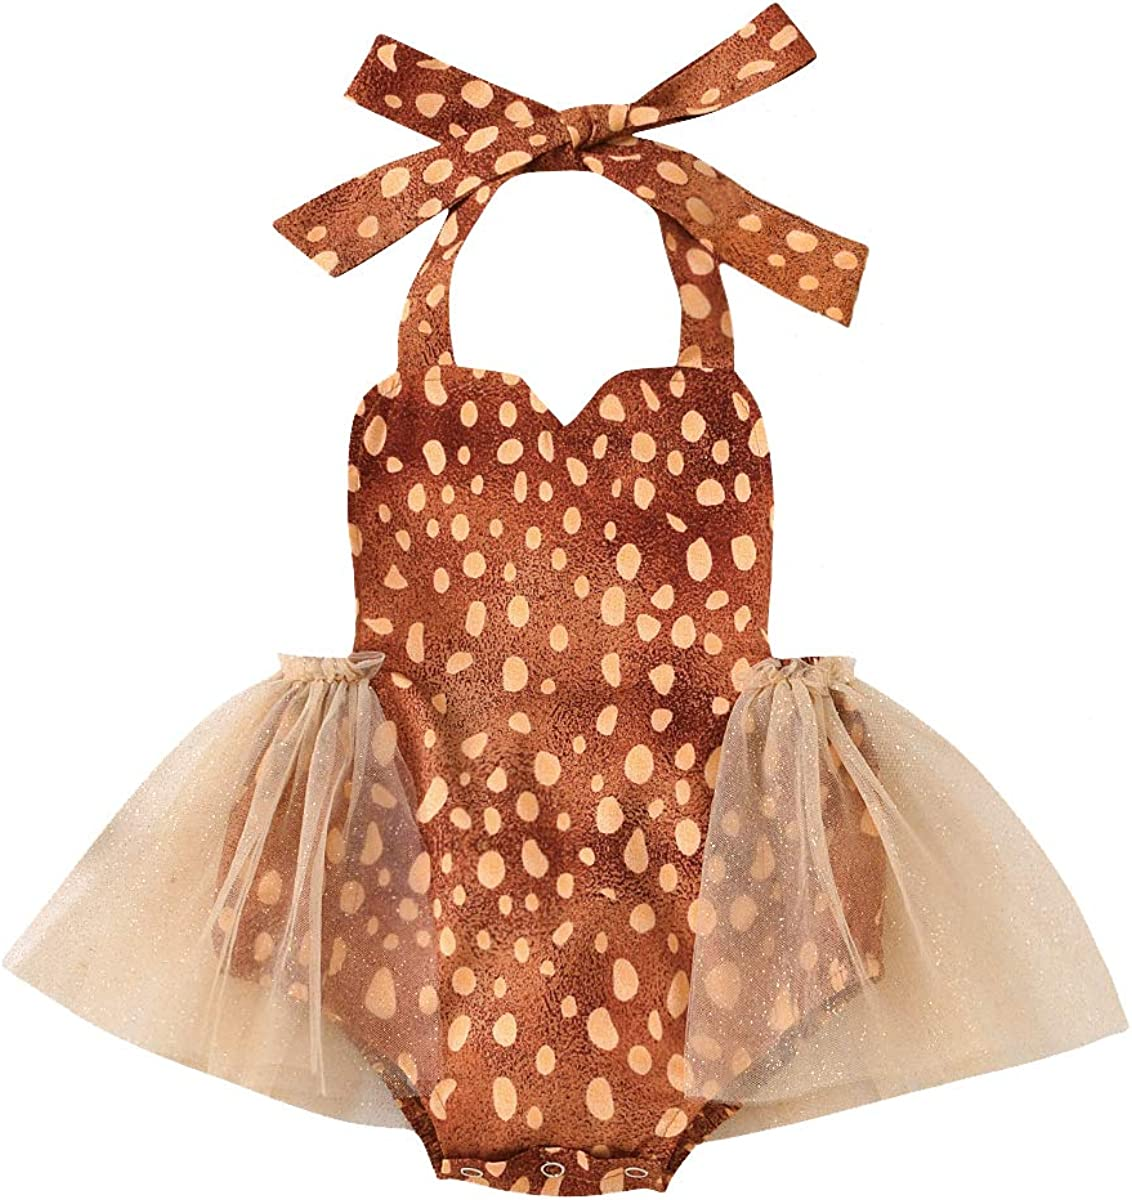 Toddler Baby Halloween Outfit Litter Girls Dresses Ghost/Thrukey Print Tutu Romper Skirts Set Thanksgiving Dress